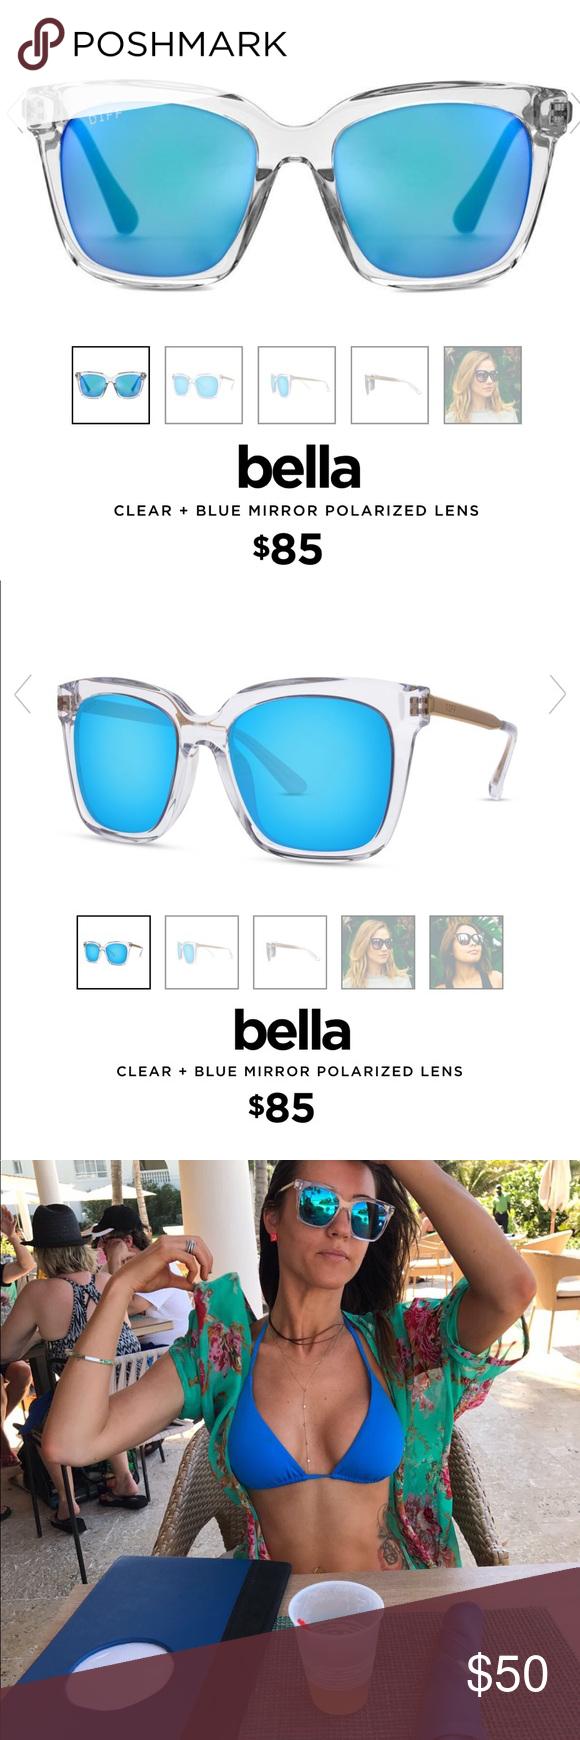 e4ffd18d4f Diff eyewear Bella Sunglasses Clear and reflective blue Bella sunglasses